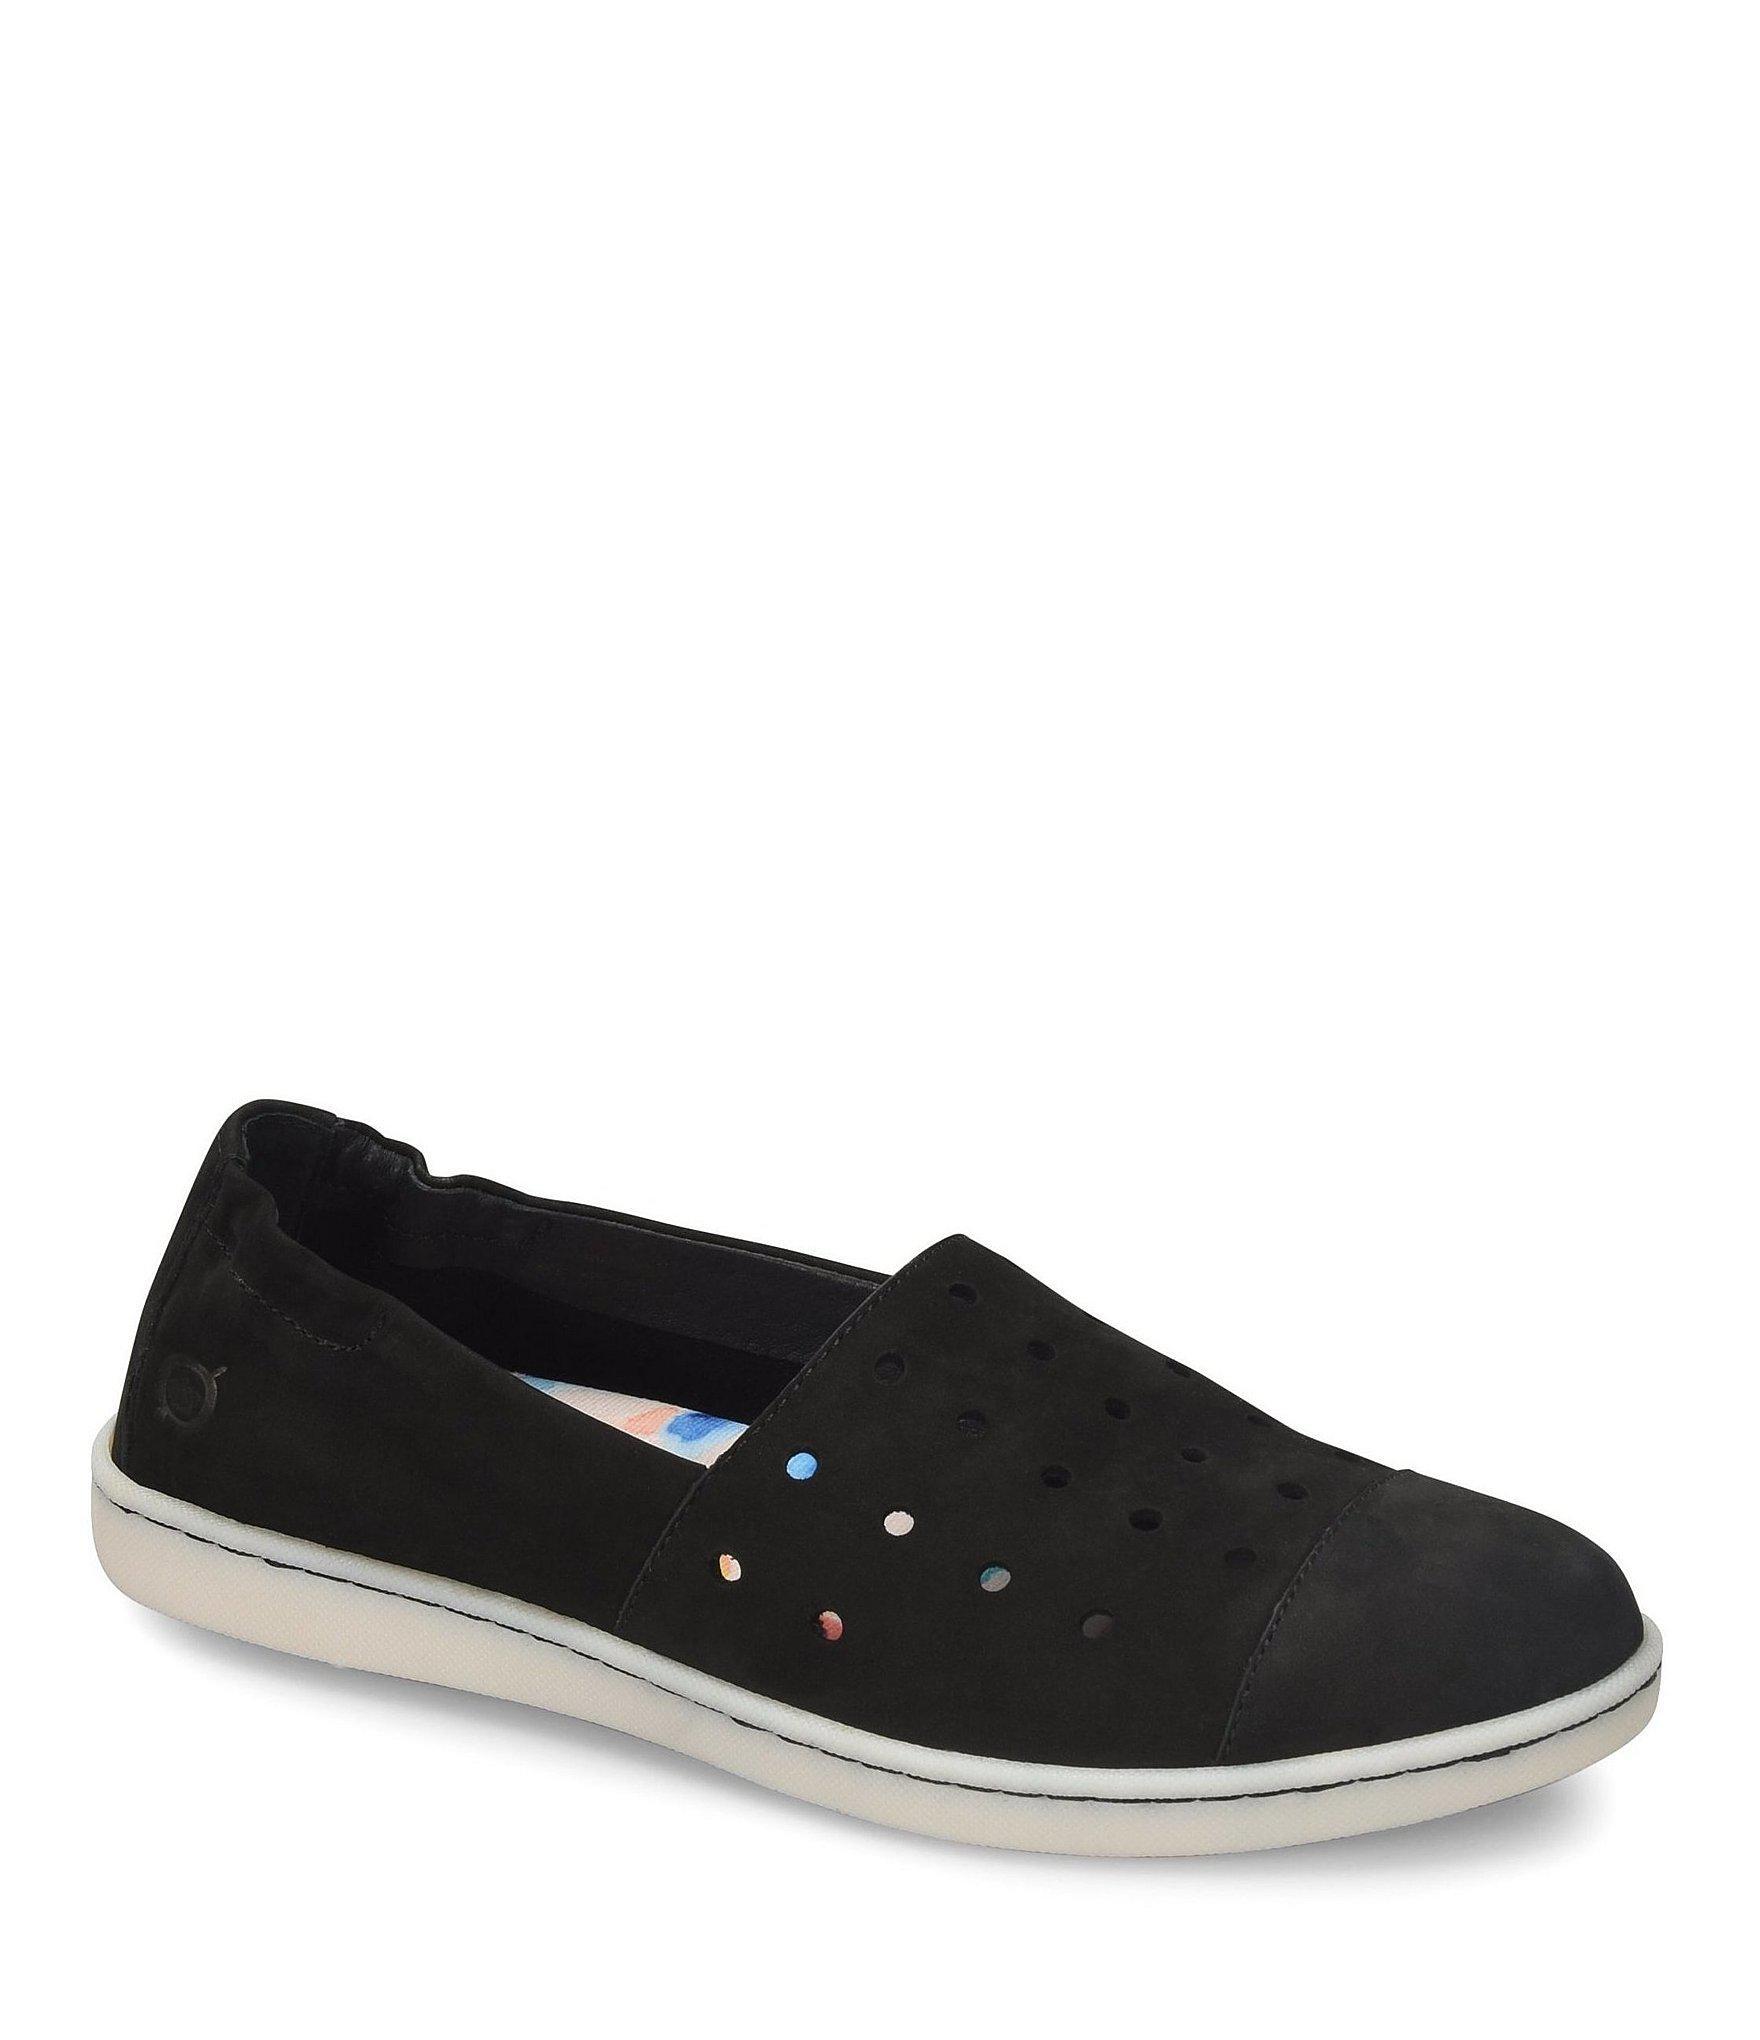 BOINN Womens Low Top Lace Up Flat Canvas Shoe Vulcanized Sole Vintage Running Go Easy Walking Sneakers